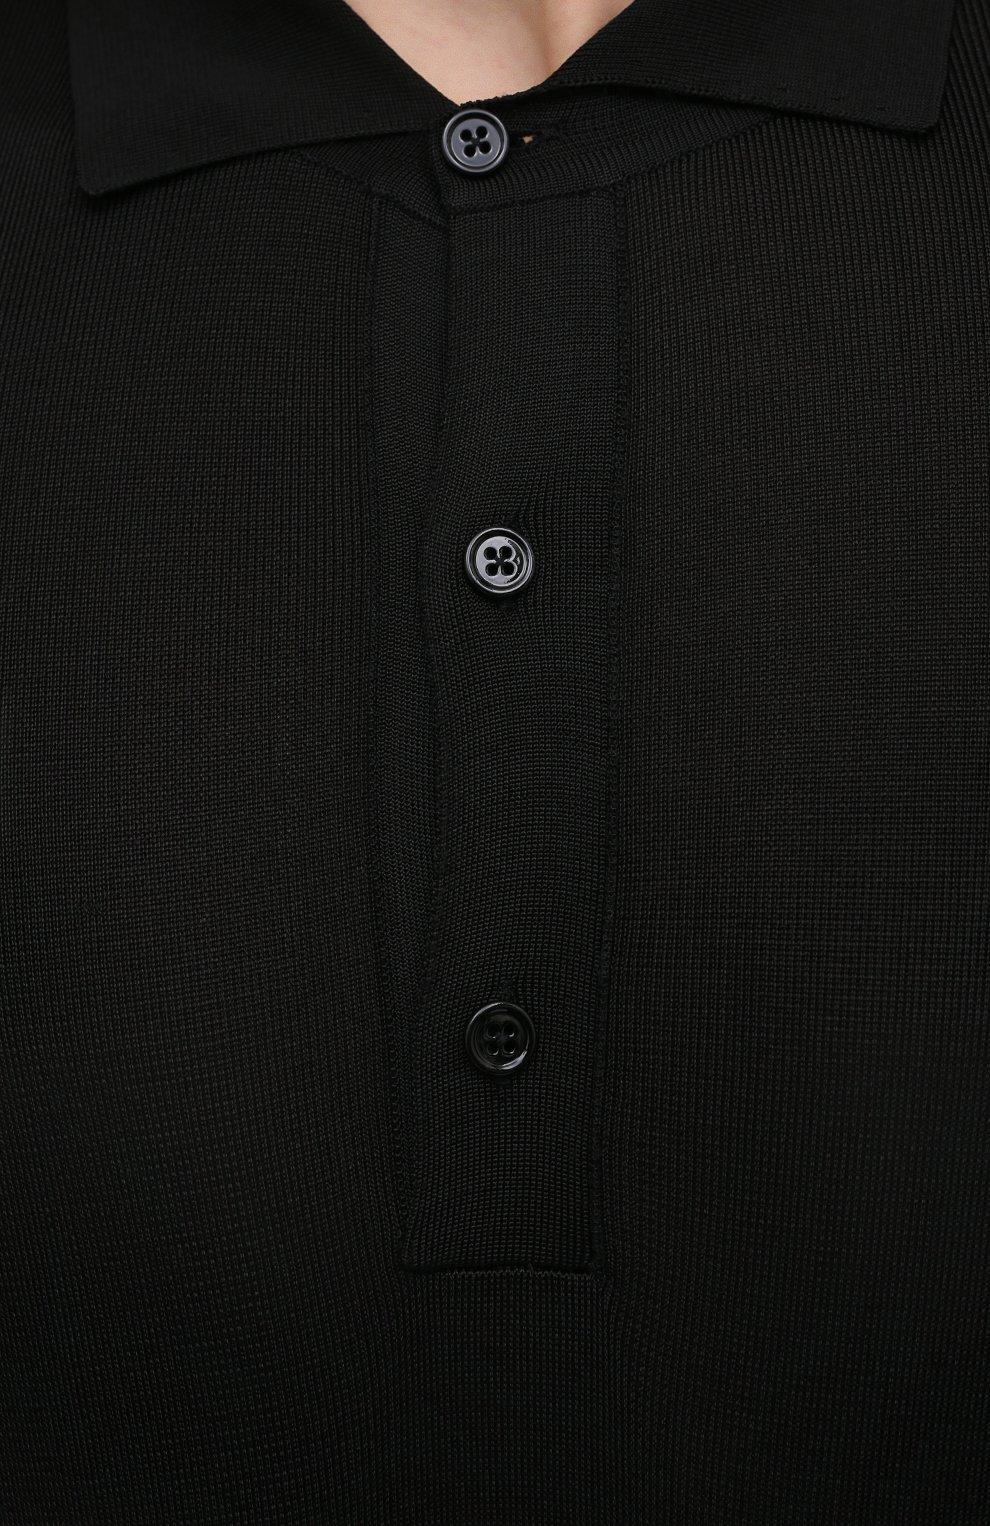 Мужское поло из вискозы TOM FORD черного цвета, арт. BWV94/TFK132 | Фото 5